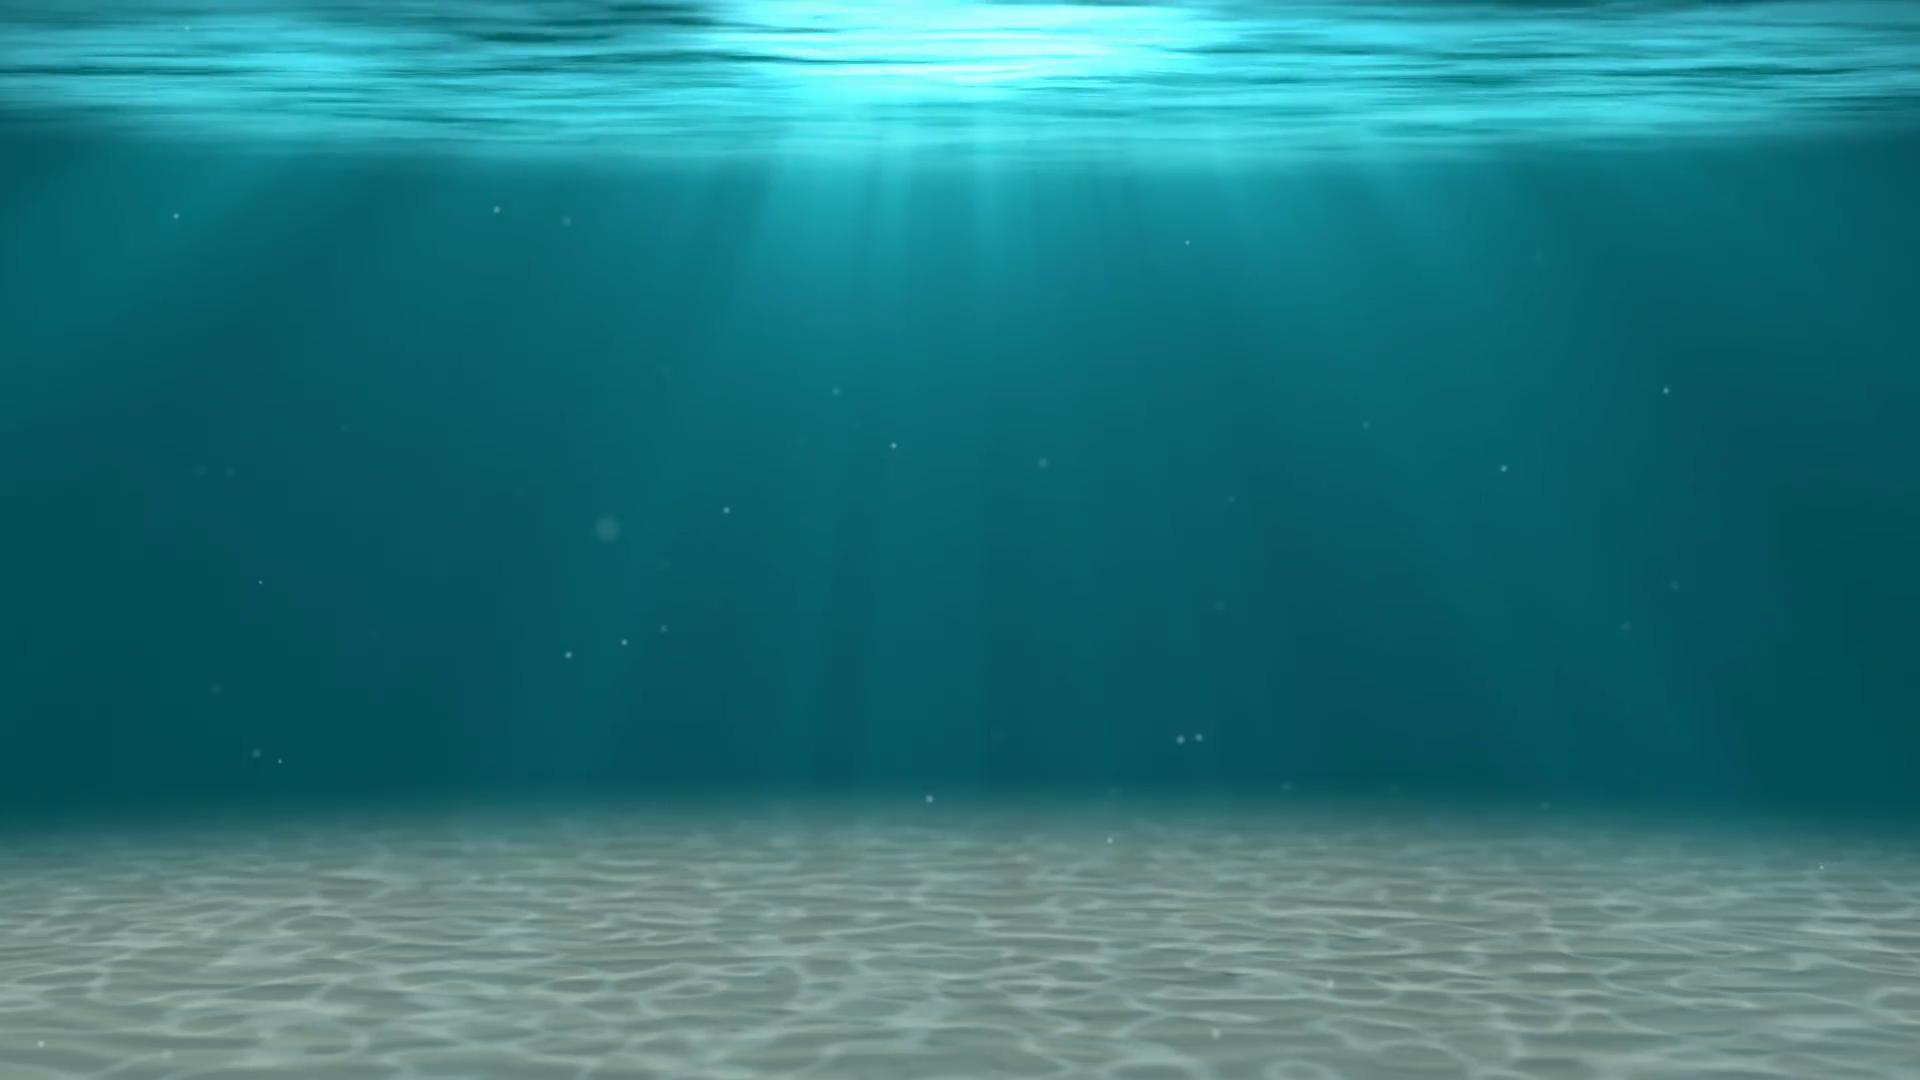 Ocean Background PNG HD - 129007